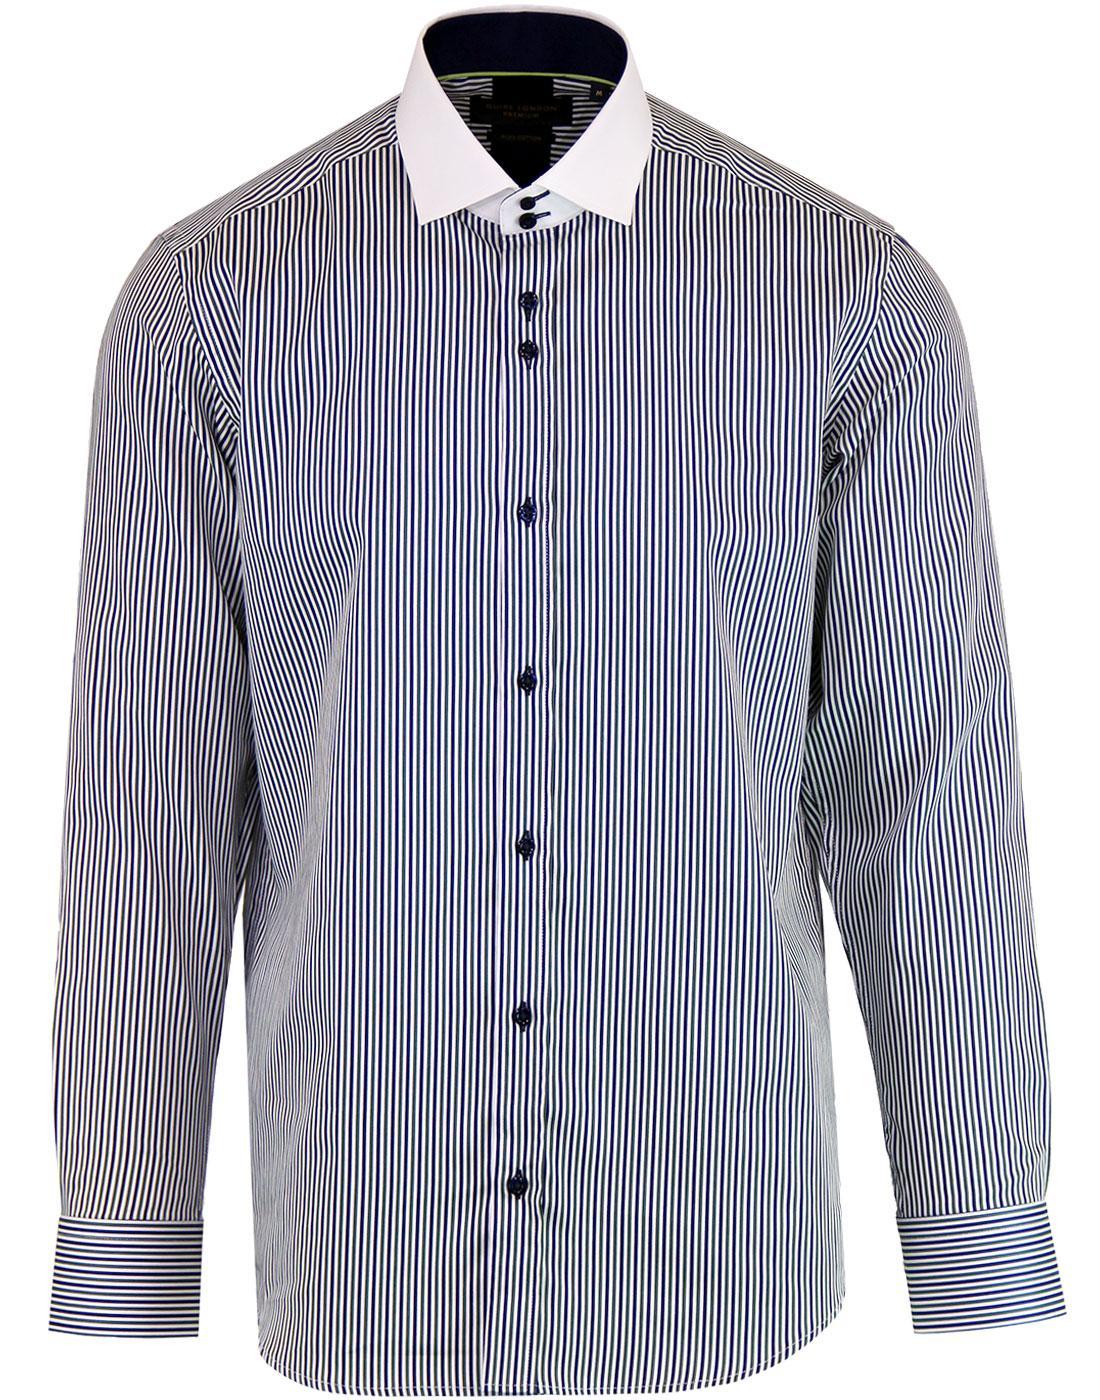 GUIDE LONDON Retro Contrast Collar Stripe Shirt G